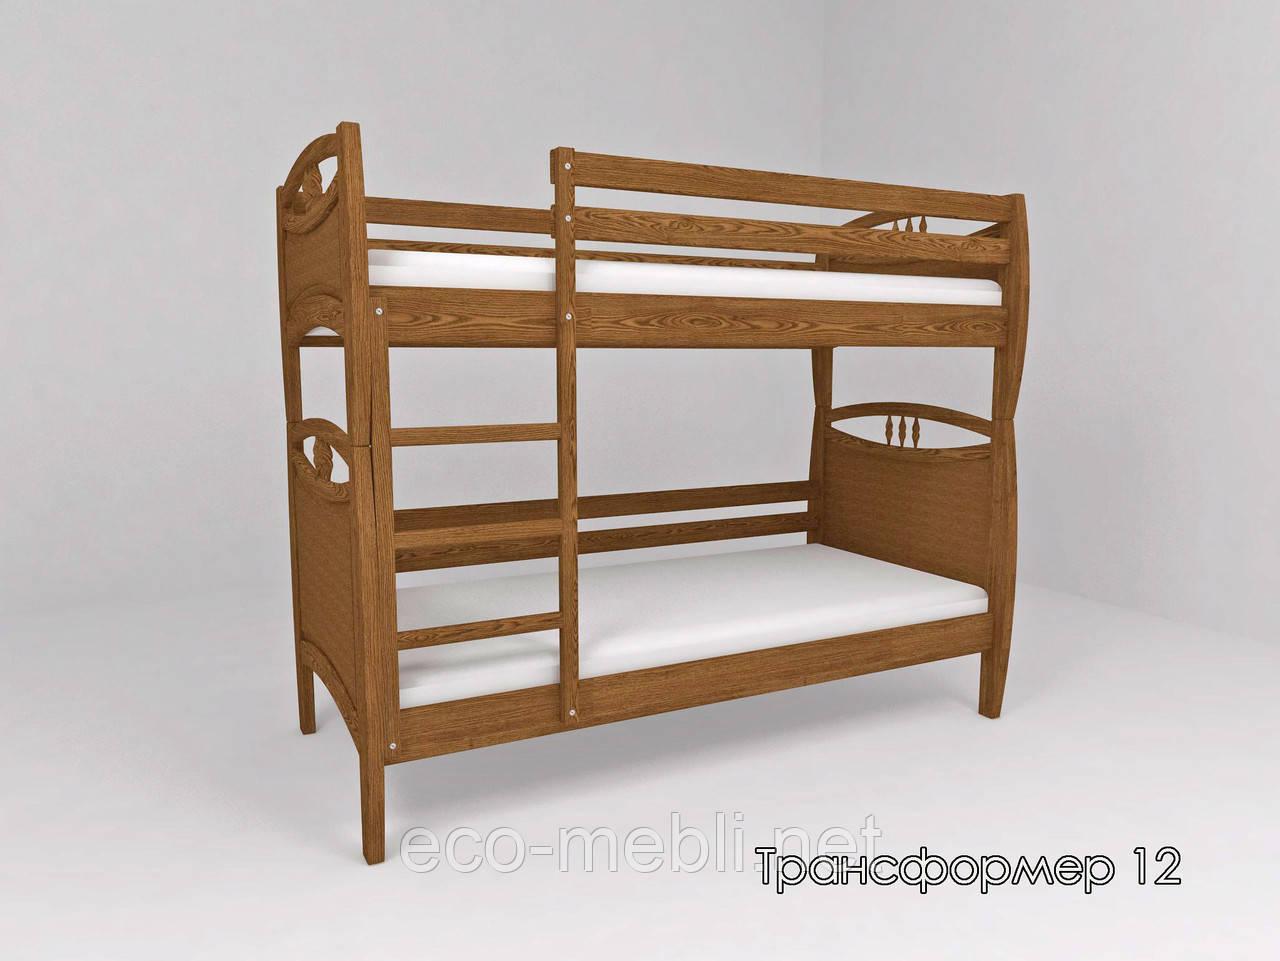 Ліжко ТИС Трансформер 12 (Сосна, Бук, Дуб)